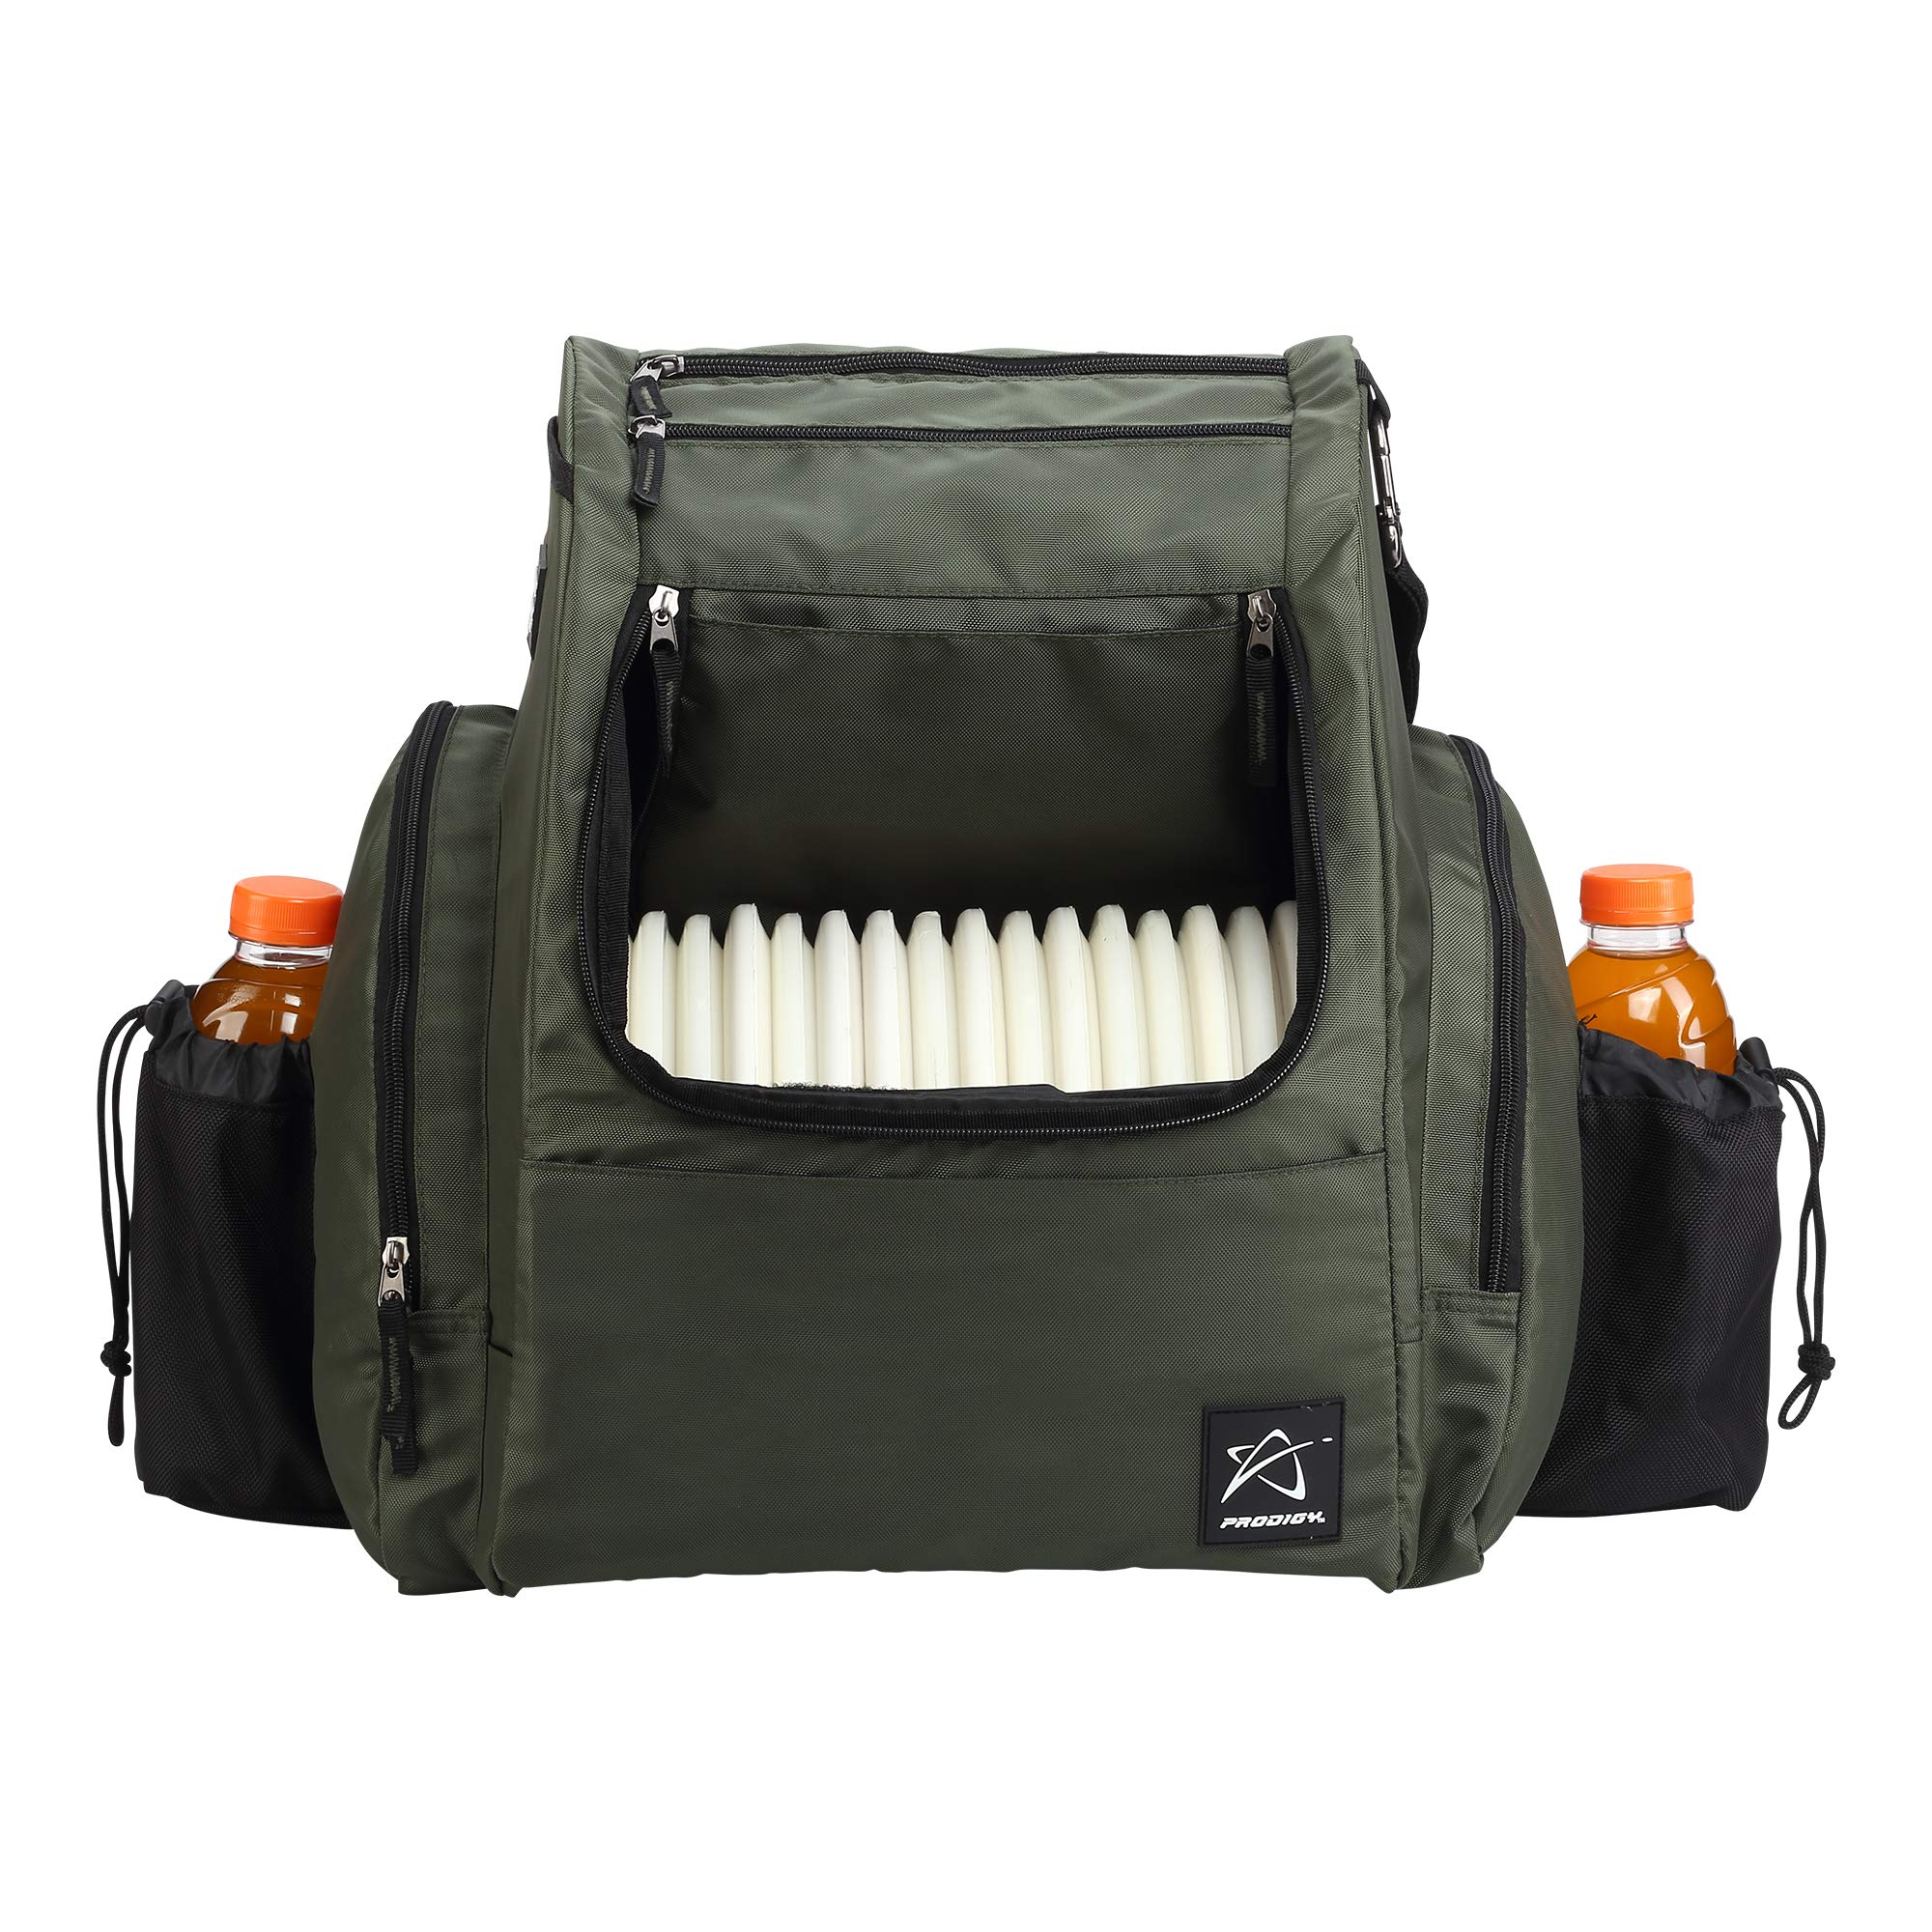 Prodigy Disc BP-2 Backpack - 2019 Model - Fits 25 Discs (Green/Black, Rainfly)